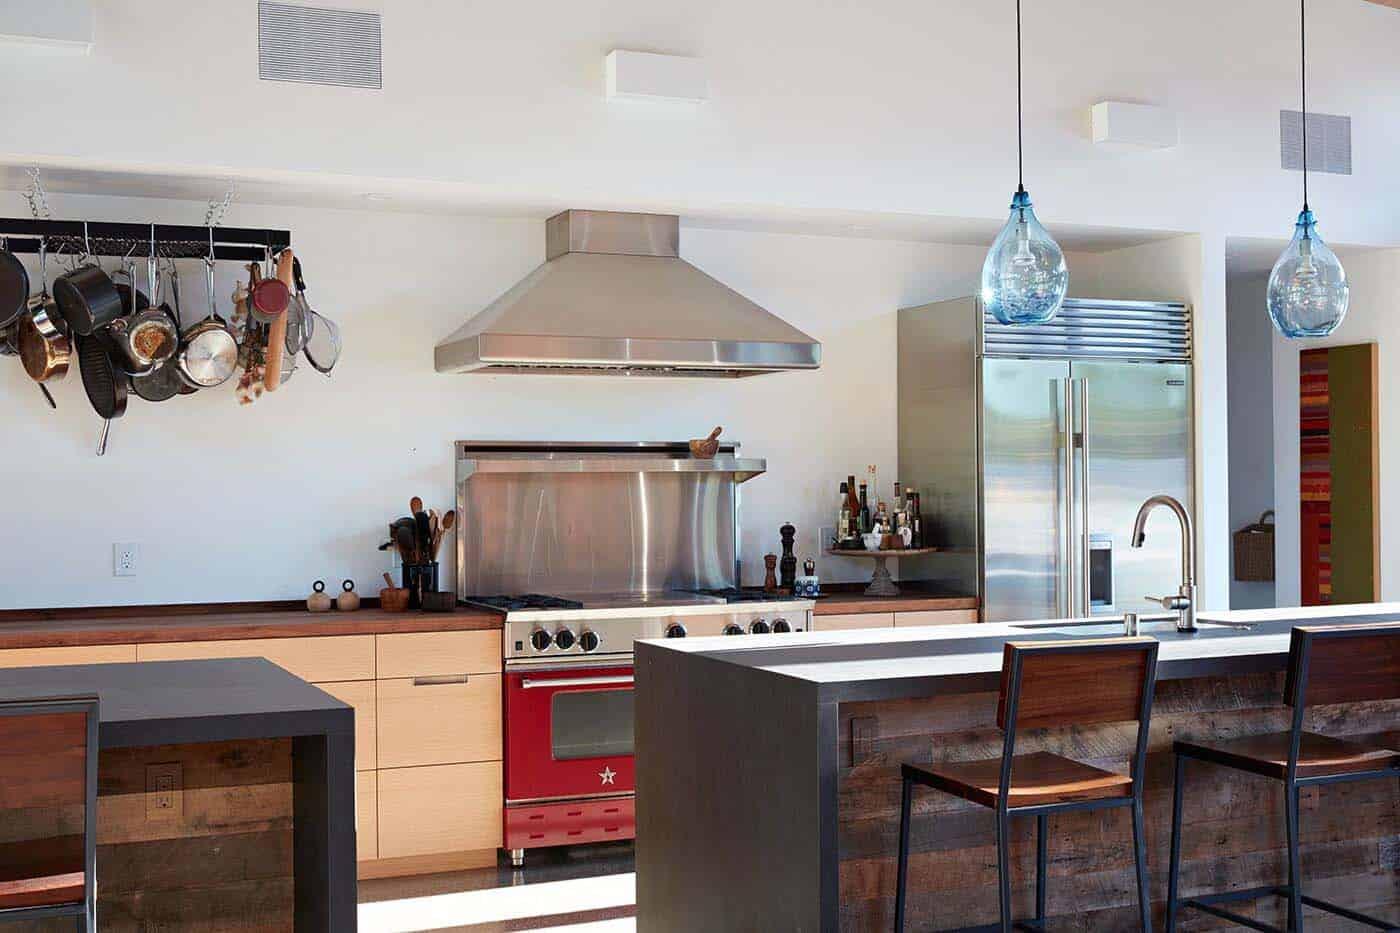 Sacramento Modern Residence-Klopf Architecture-10-1 Kindesign